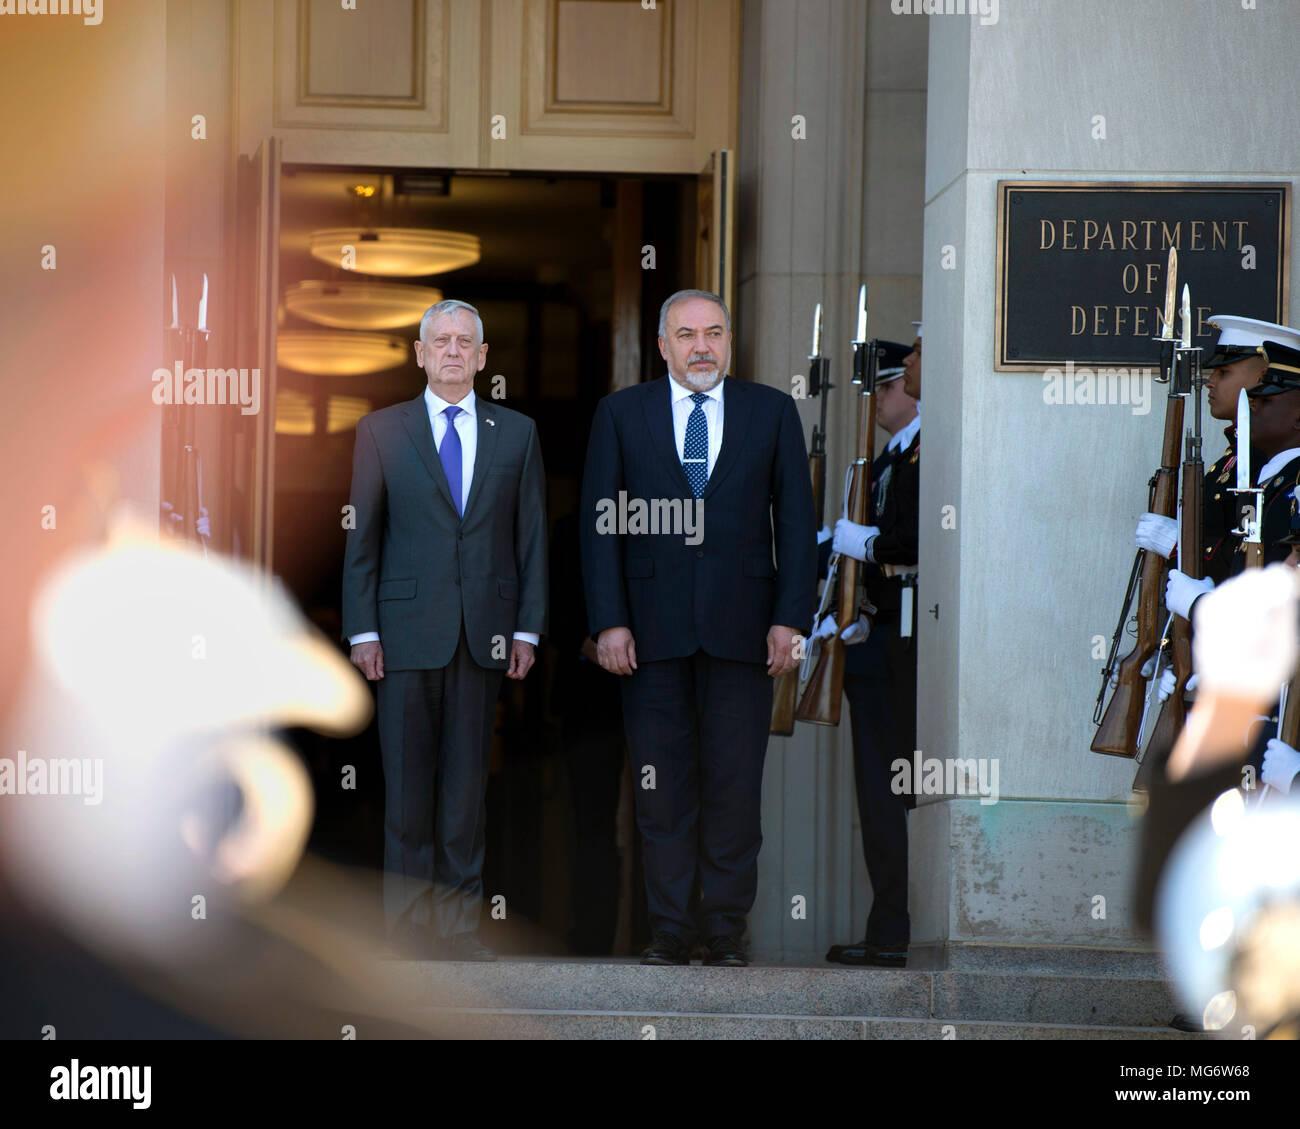 U.S. Secretary of Defense Jim Mattis stands with Israeli Defense Minister Avigdor Lieberman, right, during the arrival ceremony at the Pentagon April 26, 2018 in Arlington, Virginia. - Stock Image